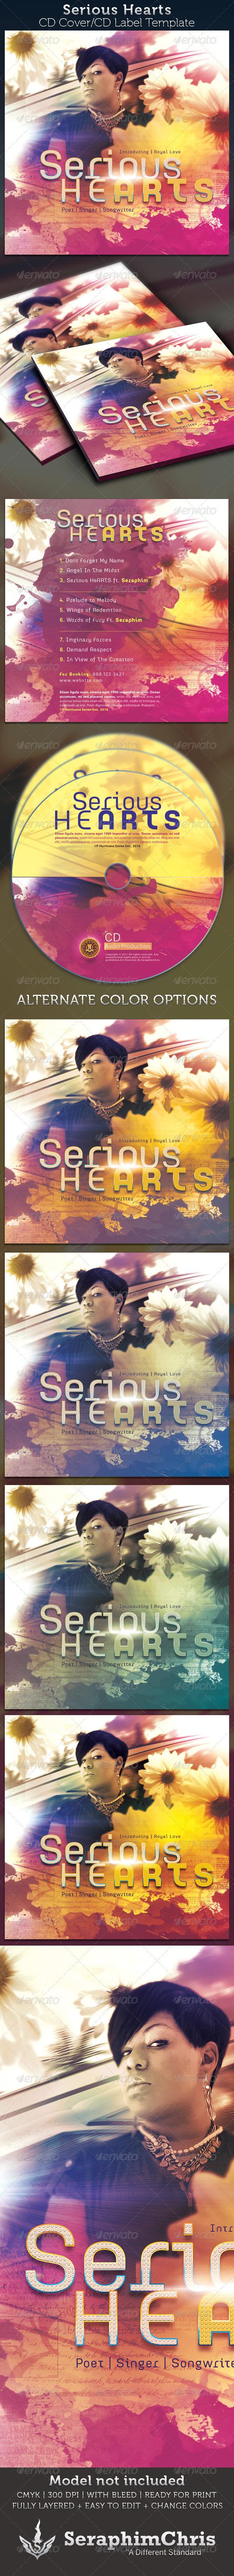 Serious Hearts CD Cover Artwork Template - CD & DVD Artwork Print Templates